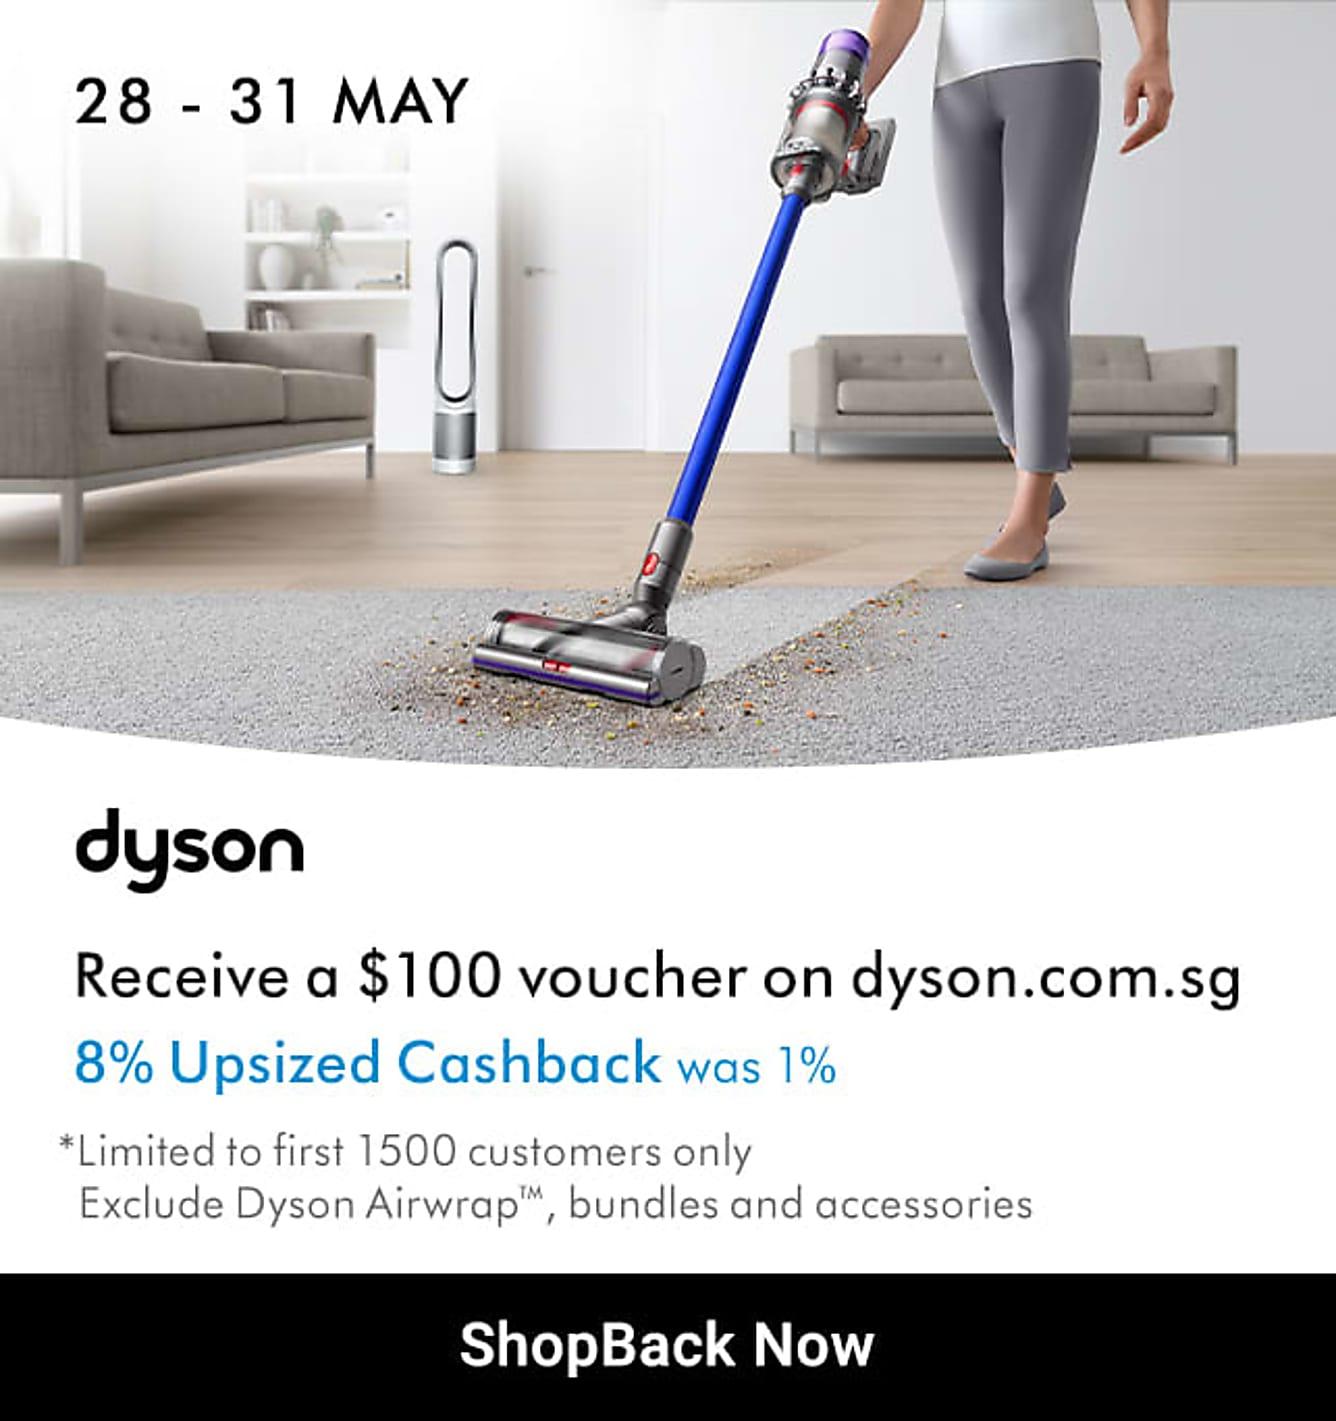 Dyson_Upsize_28 May-31 May 2020